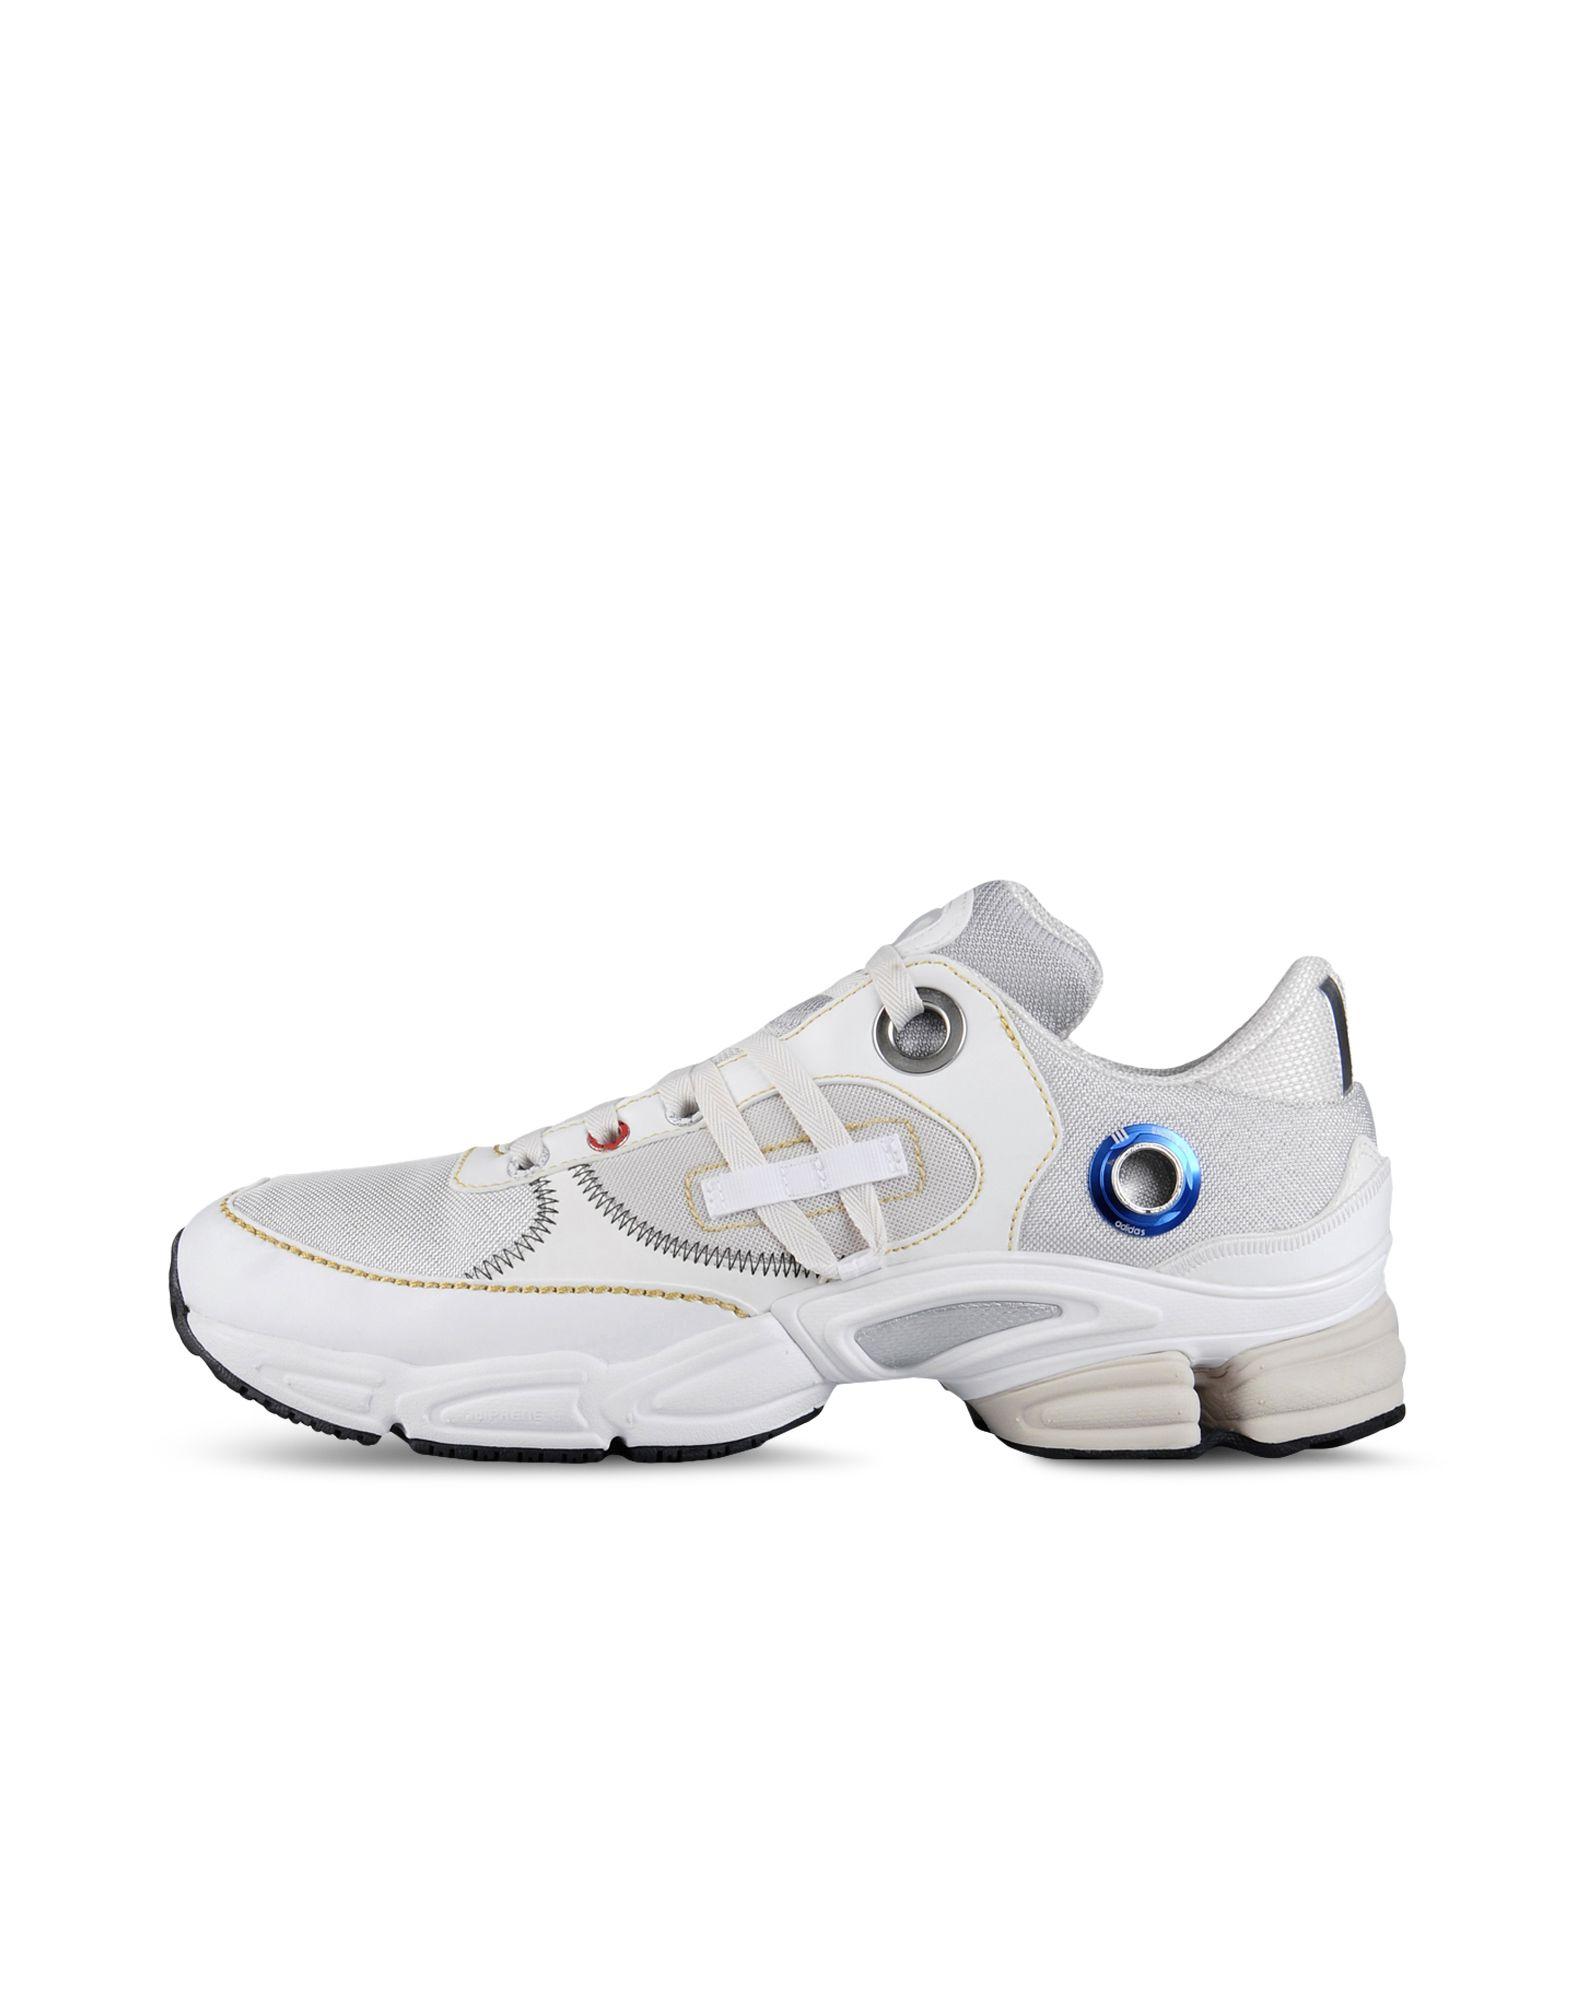 wholesale dealer de79e f8741 RAF SIMONS OZWEEGO 2 Sneakers   Adidas Y-3 Official Site